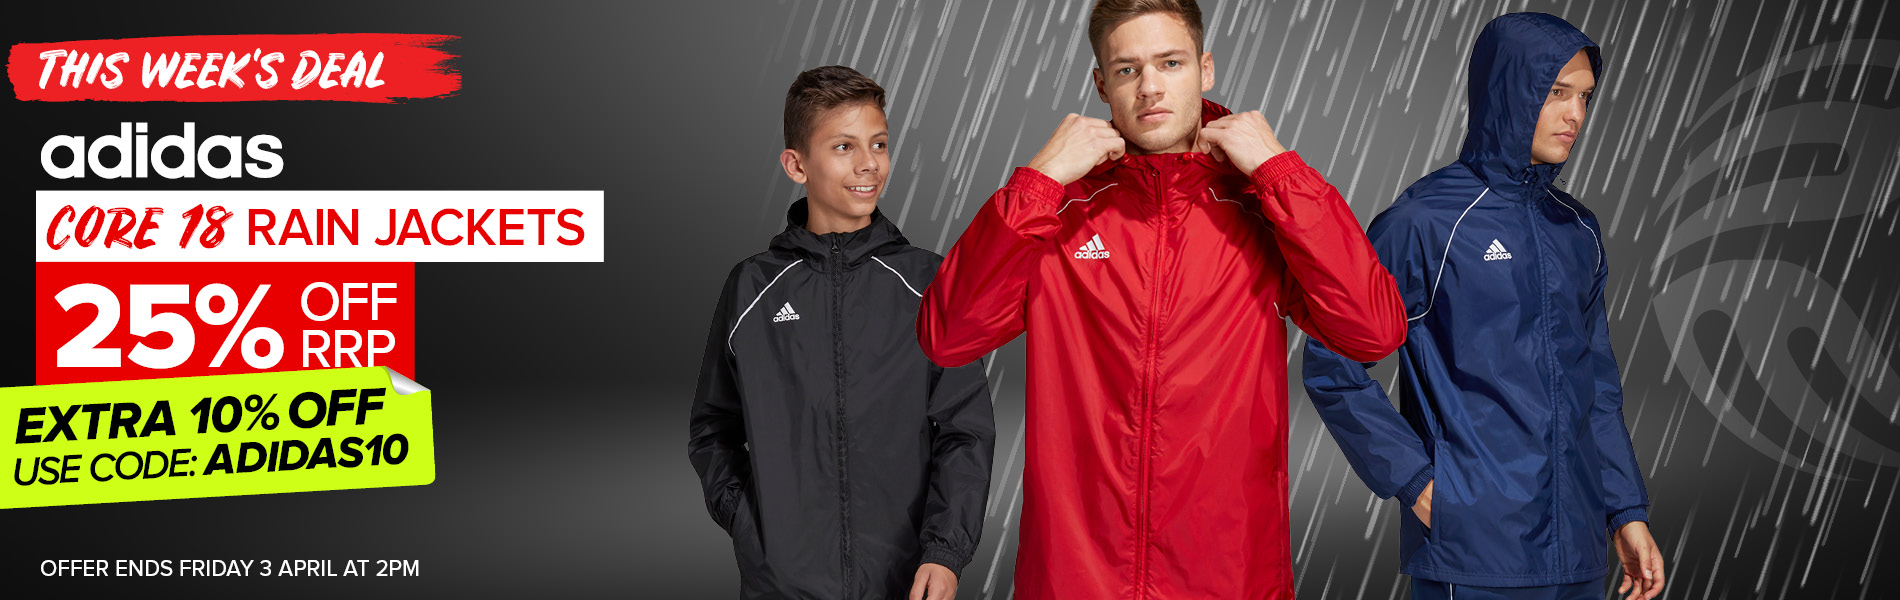 adidas Core 18 Rain Jackets